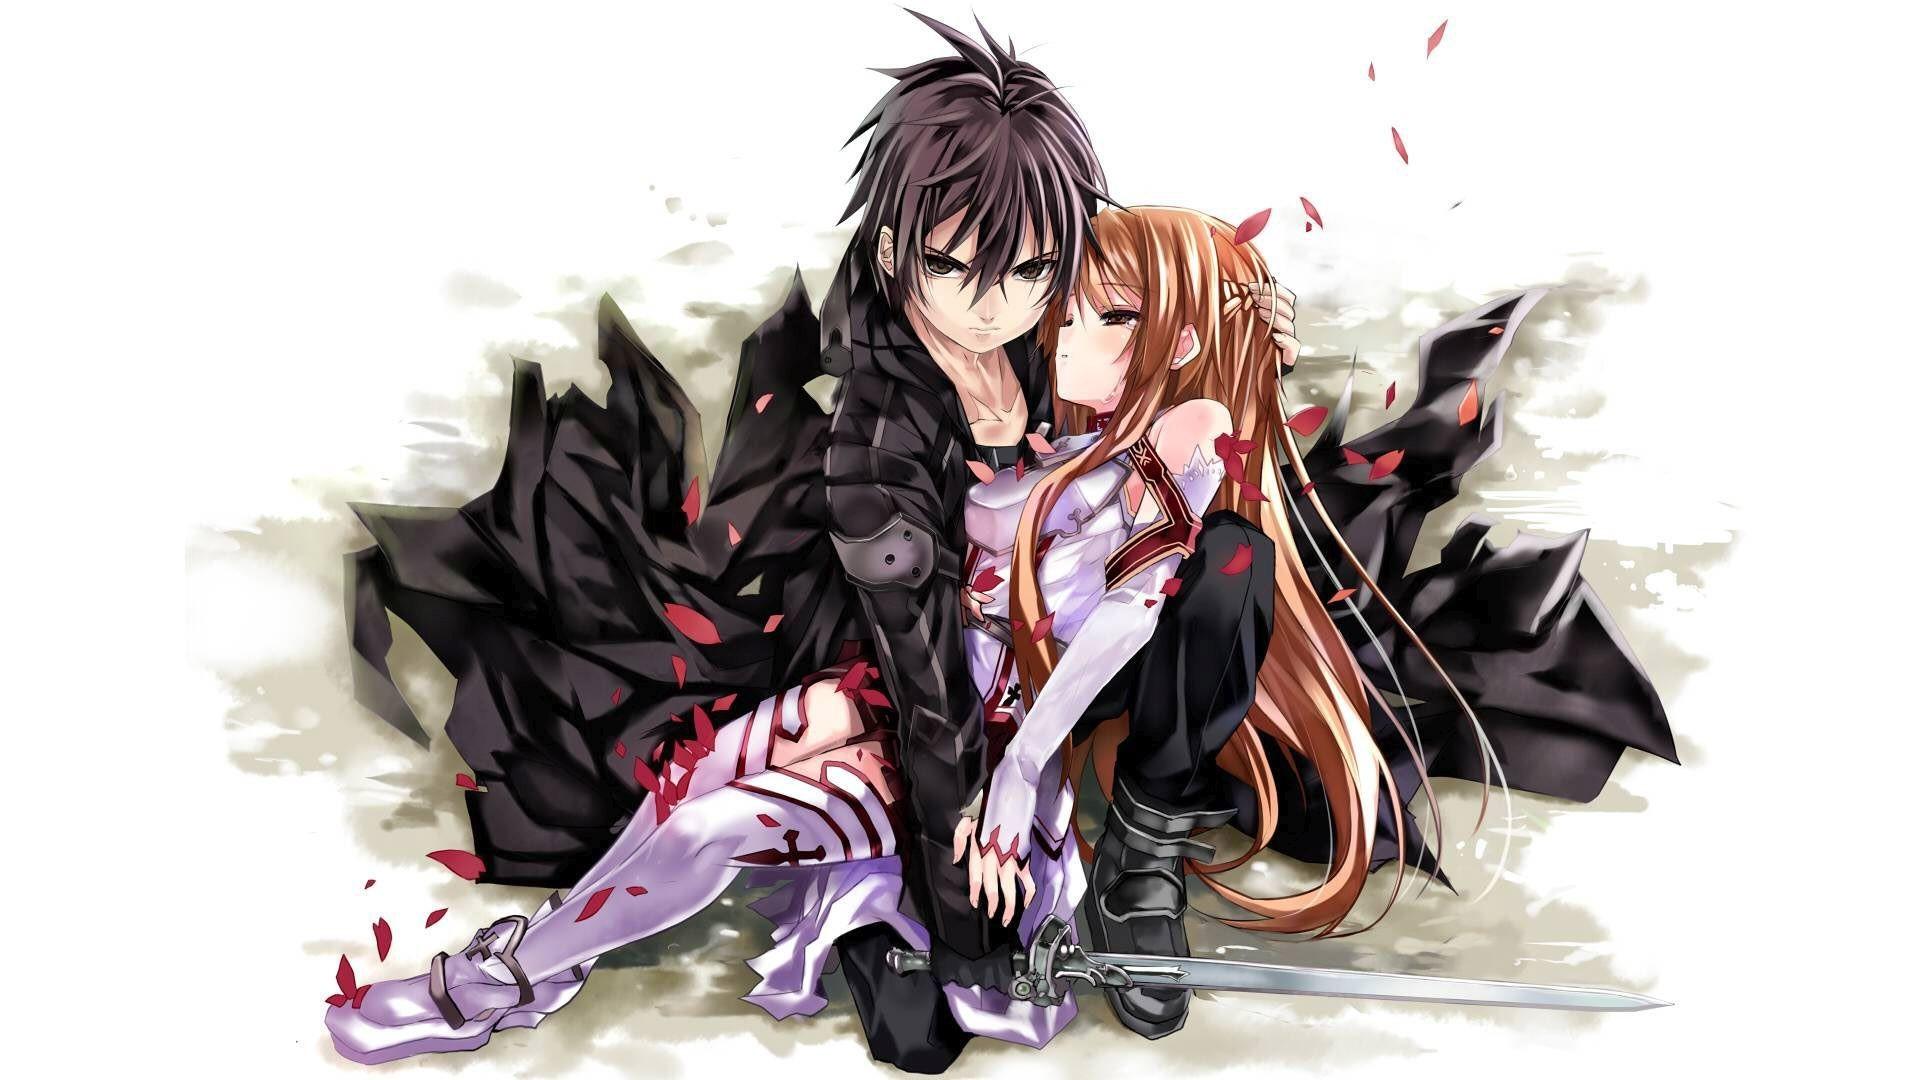 Asuna and Kirito – Sword Art Online HD Wallpaper 1920×1080